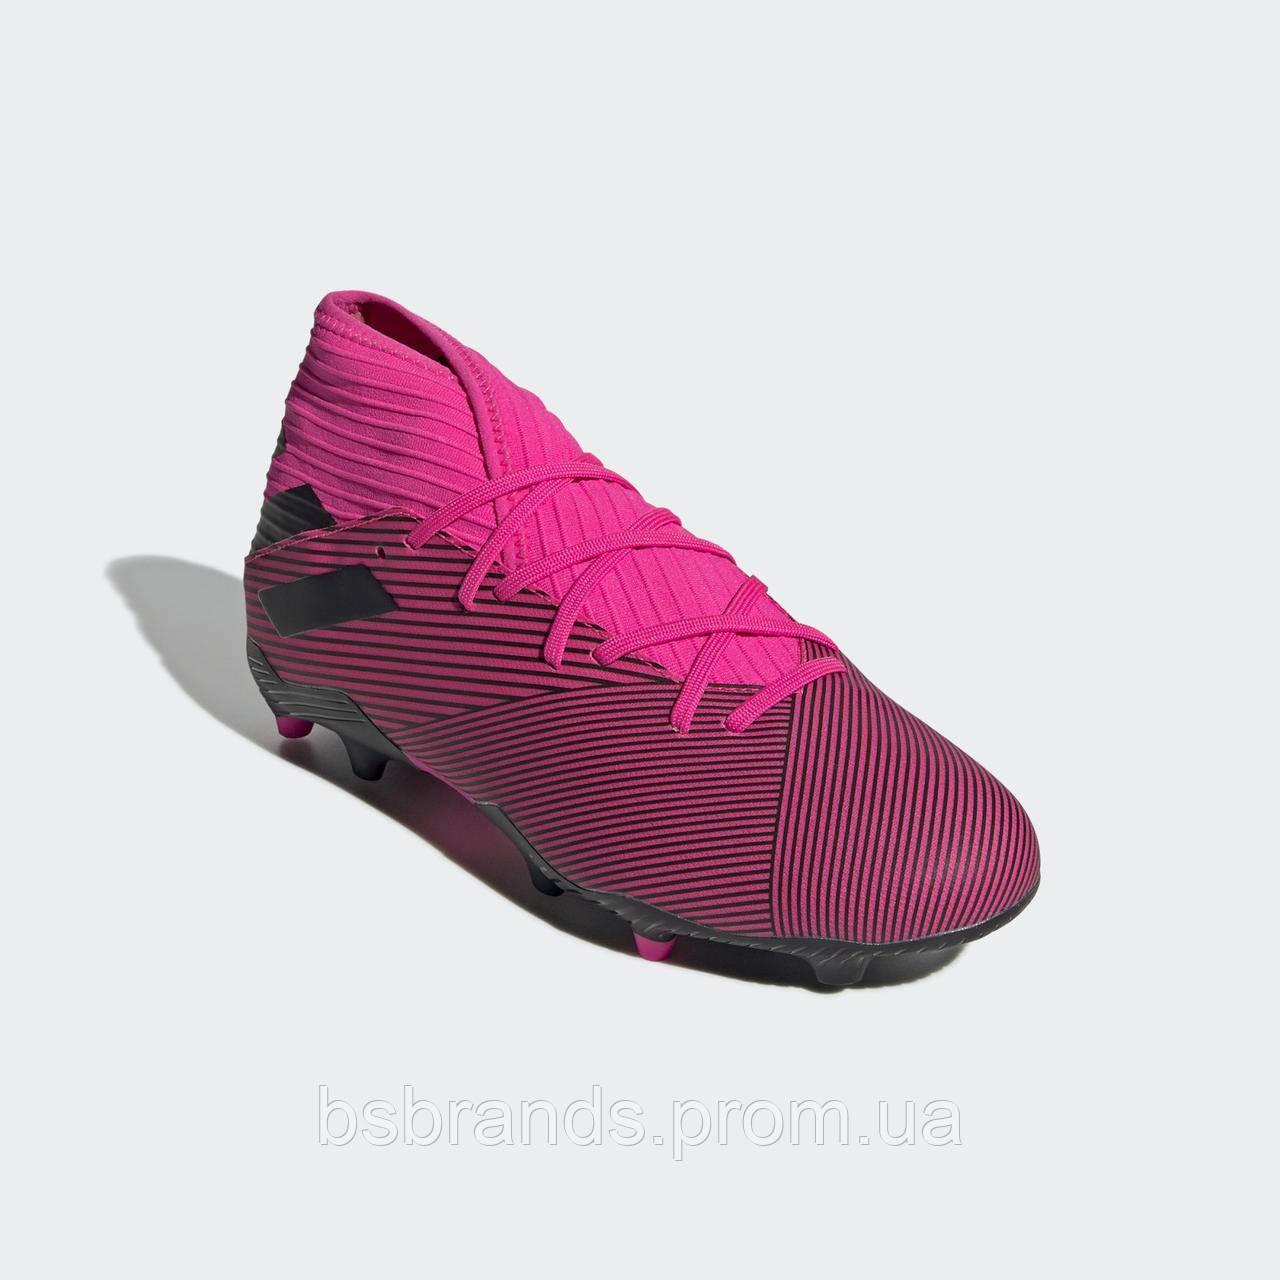 Мужские бутсы Adidas Nemeziz 19.3 FG (Артикул:F34388)